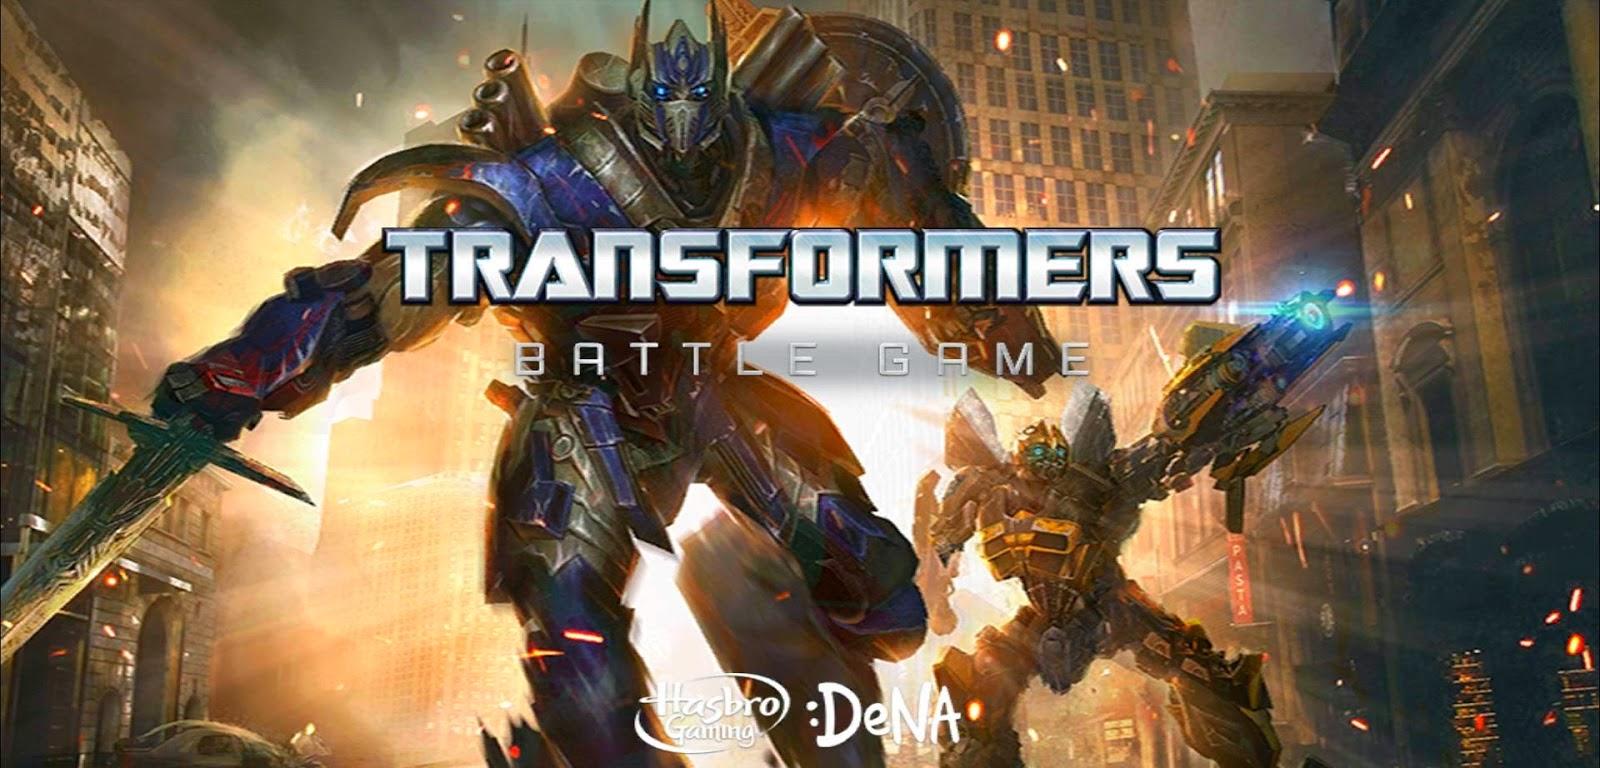 The Best Fighting |TRANSFORMERS: BATTLE GAME| v1 0 0 Apk